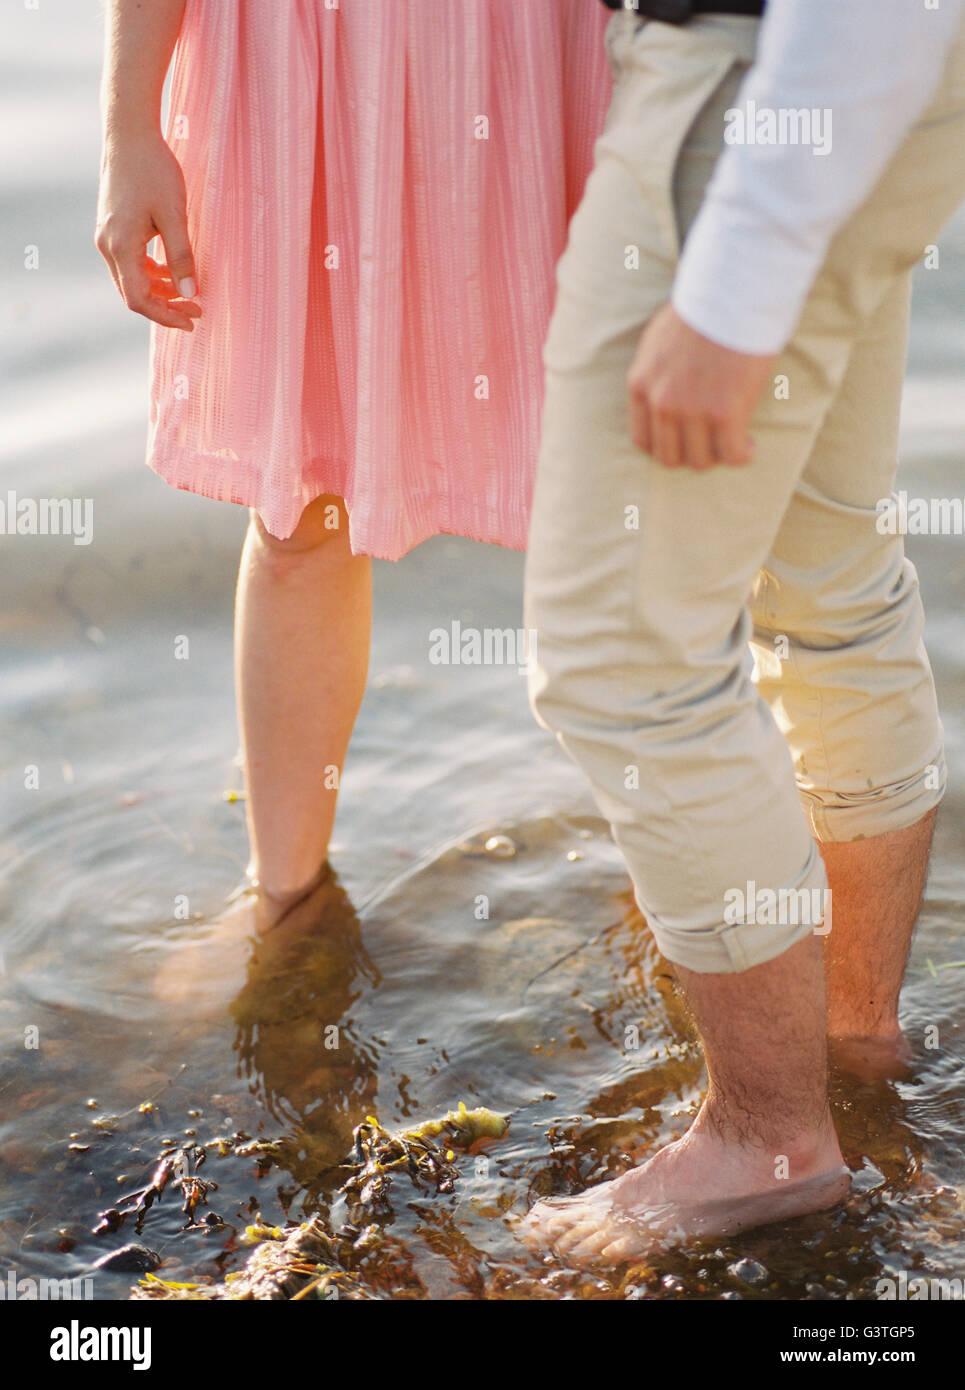 Sweden, Bohuslan, Fjallbacka, Couple standing barefoot in water Stock Photo